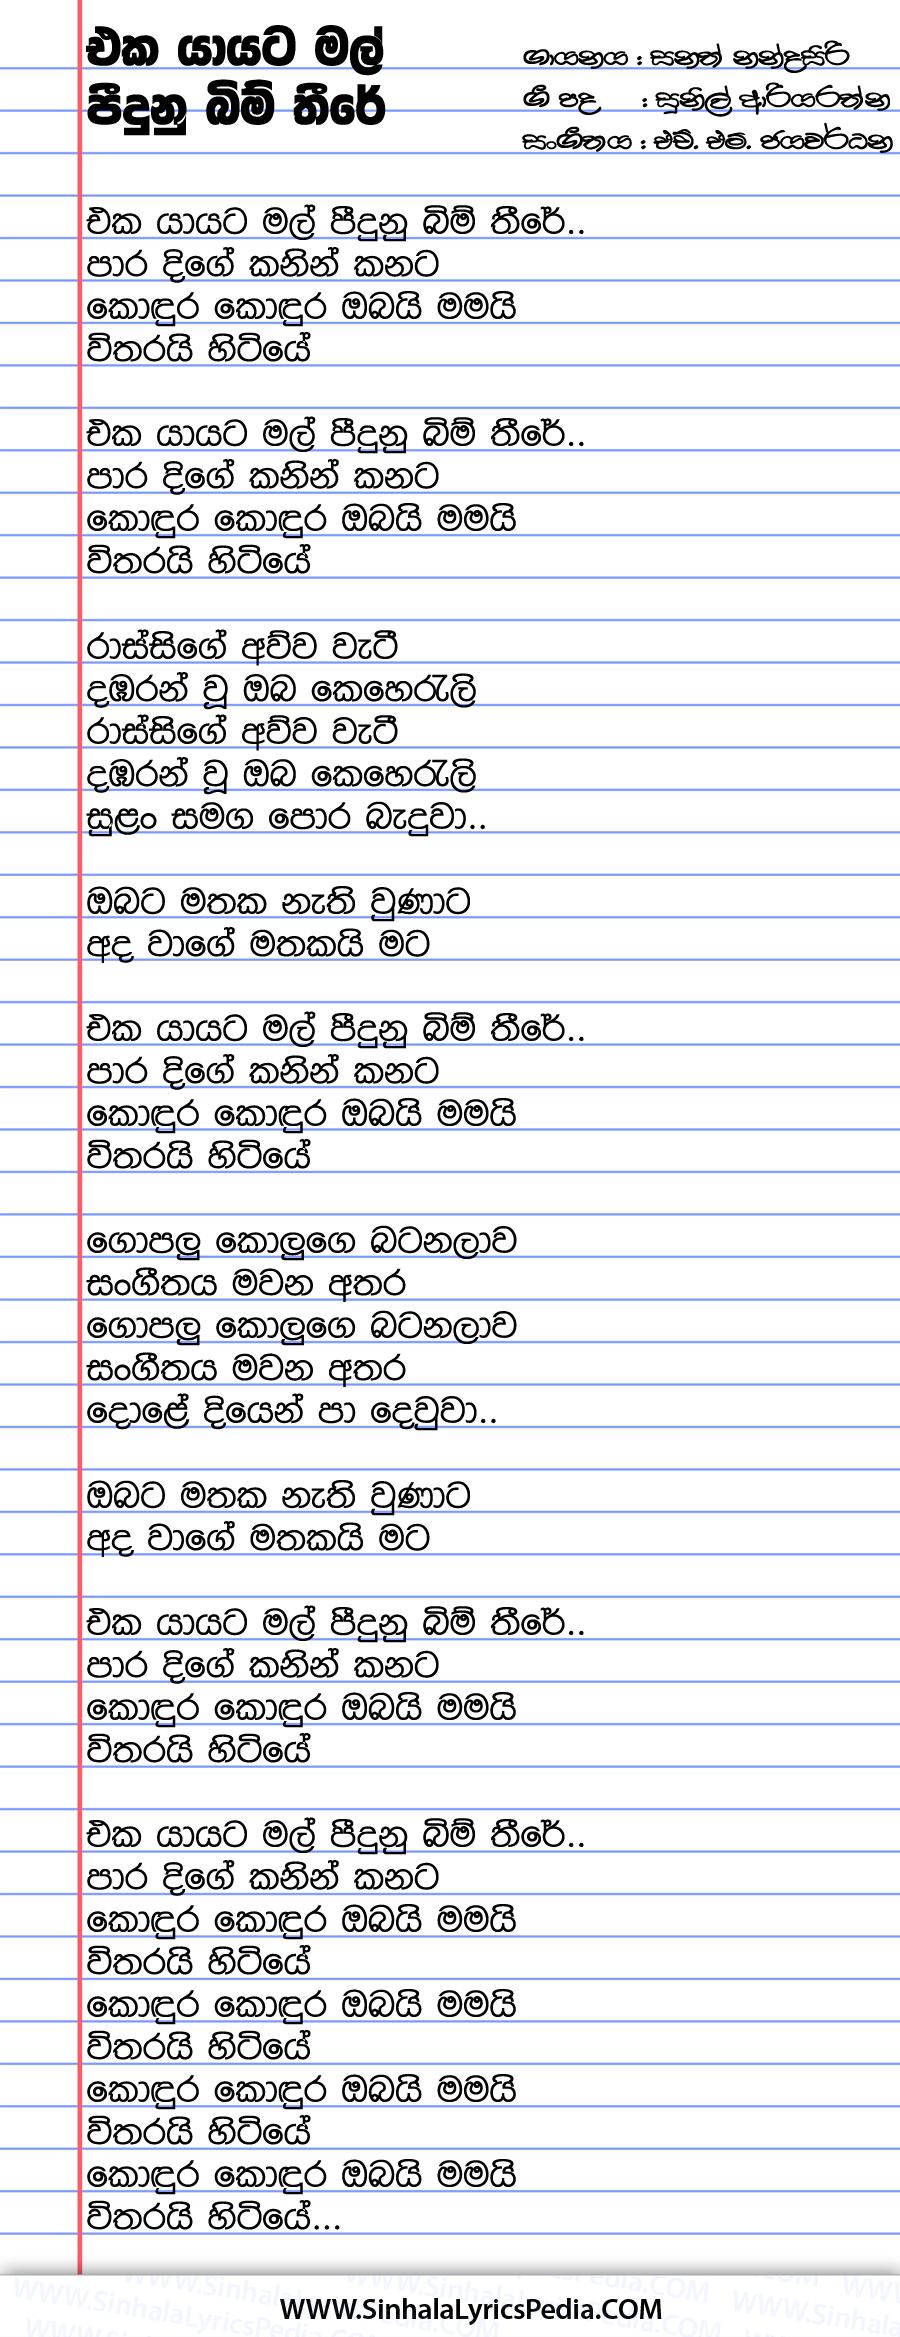 Eka Yayata Mal Peedunu Song Lyrics